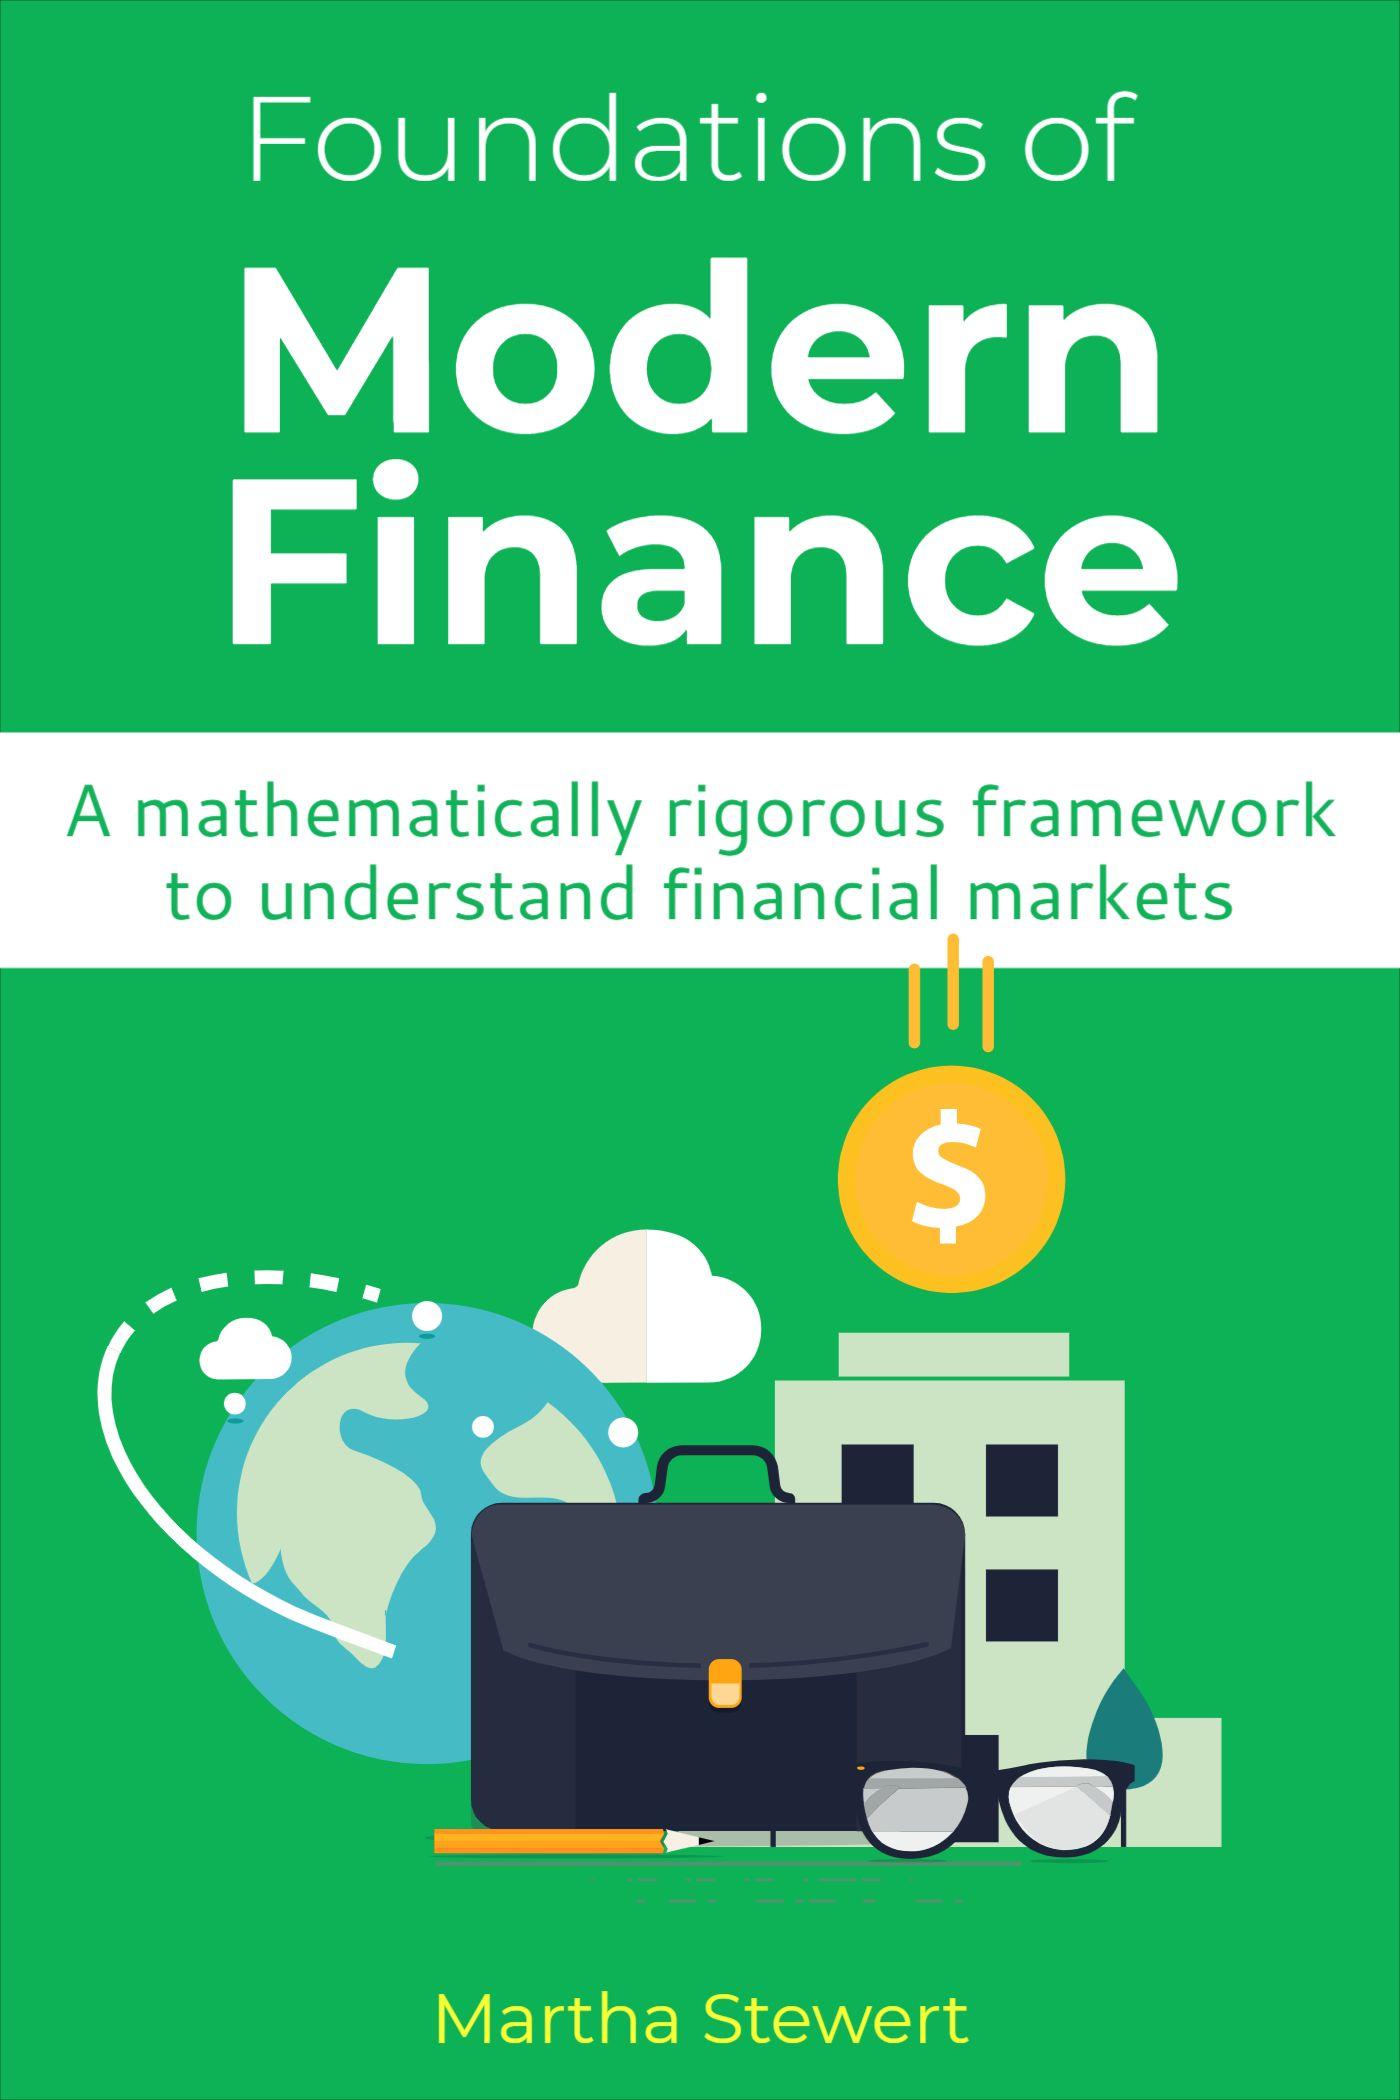 Modern Finance Book Cover Design